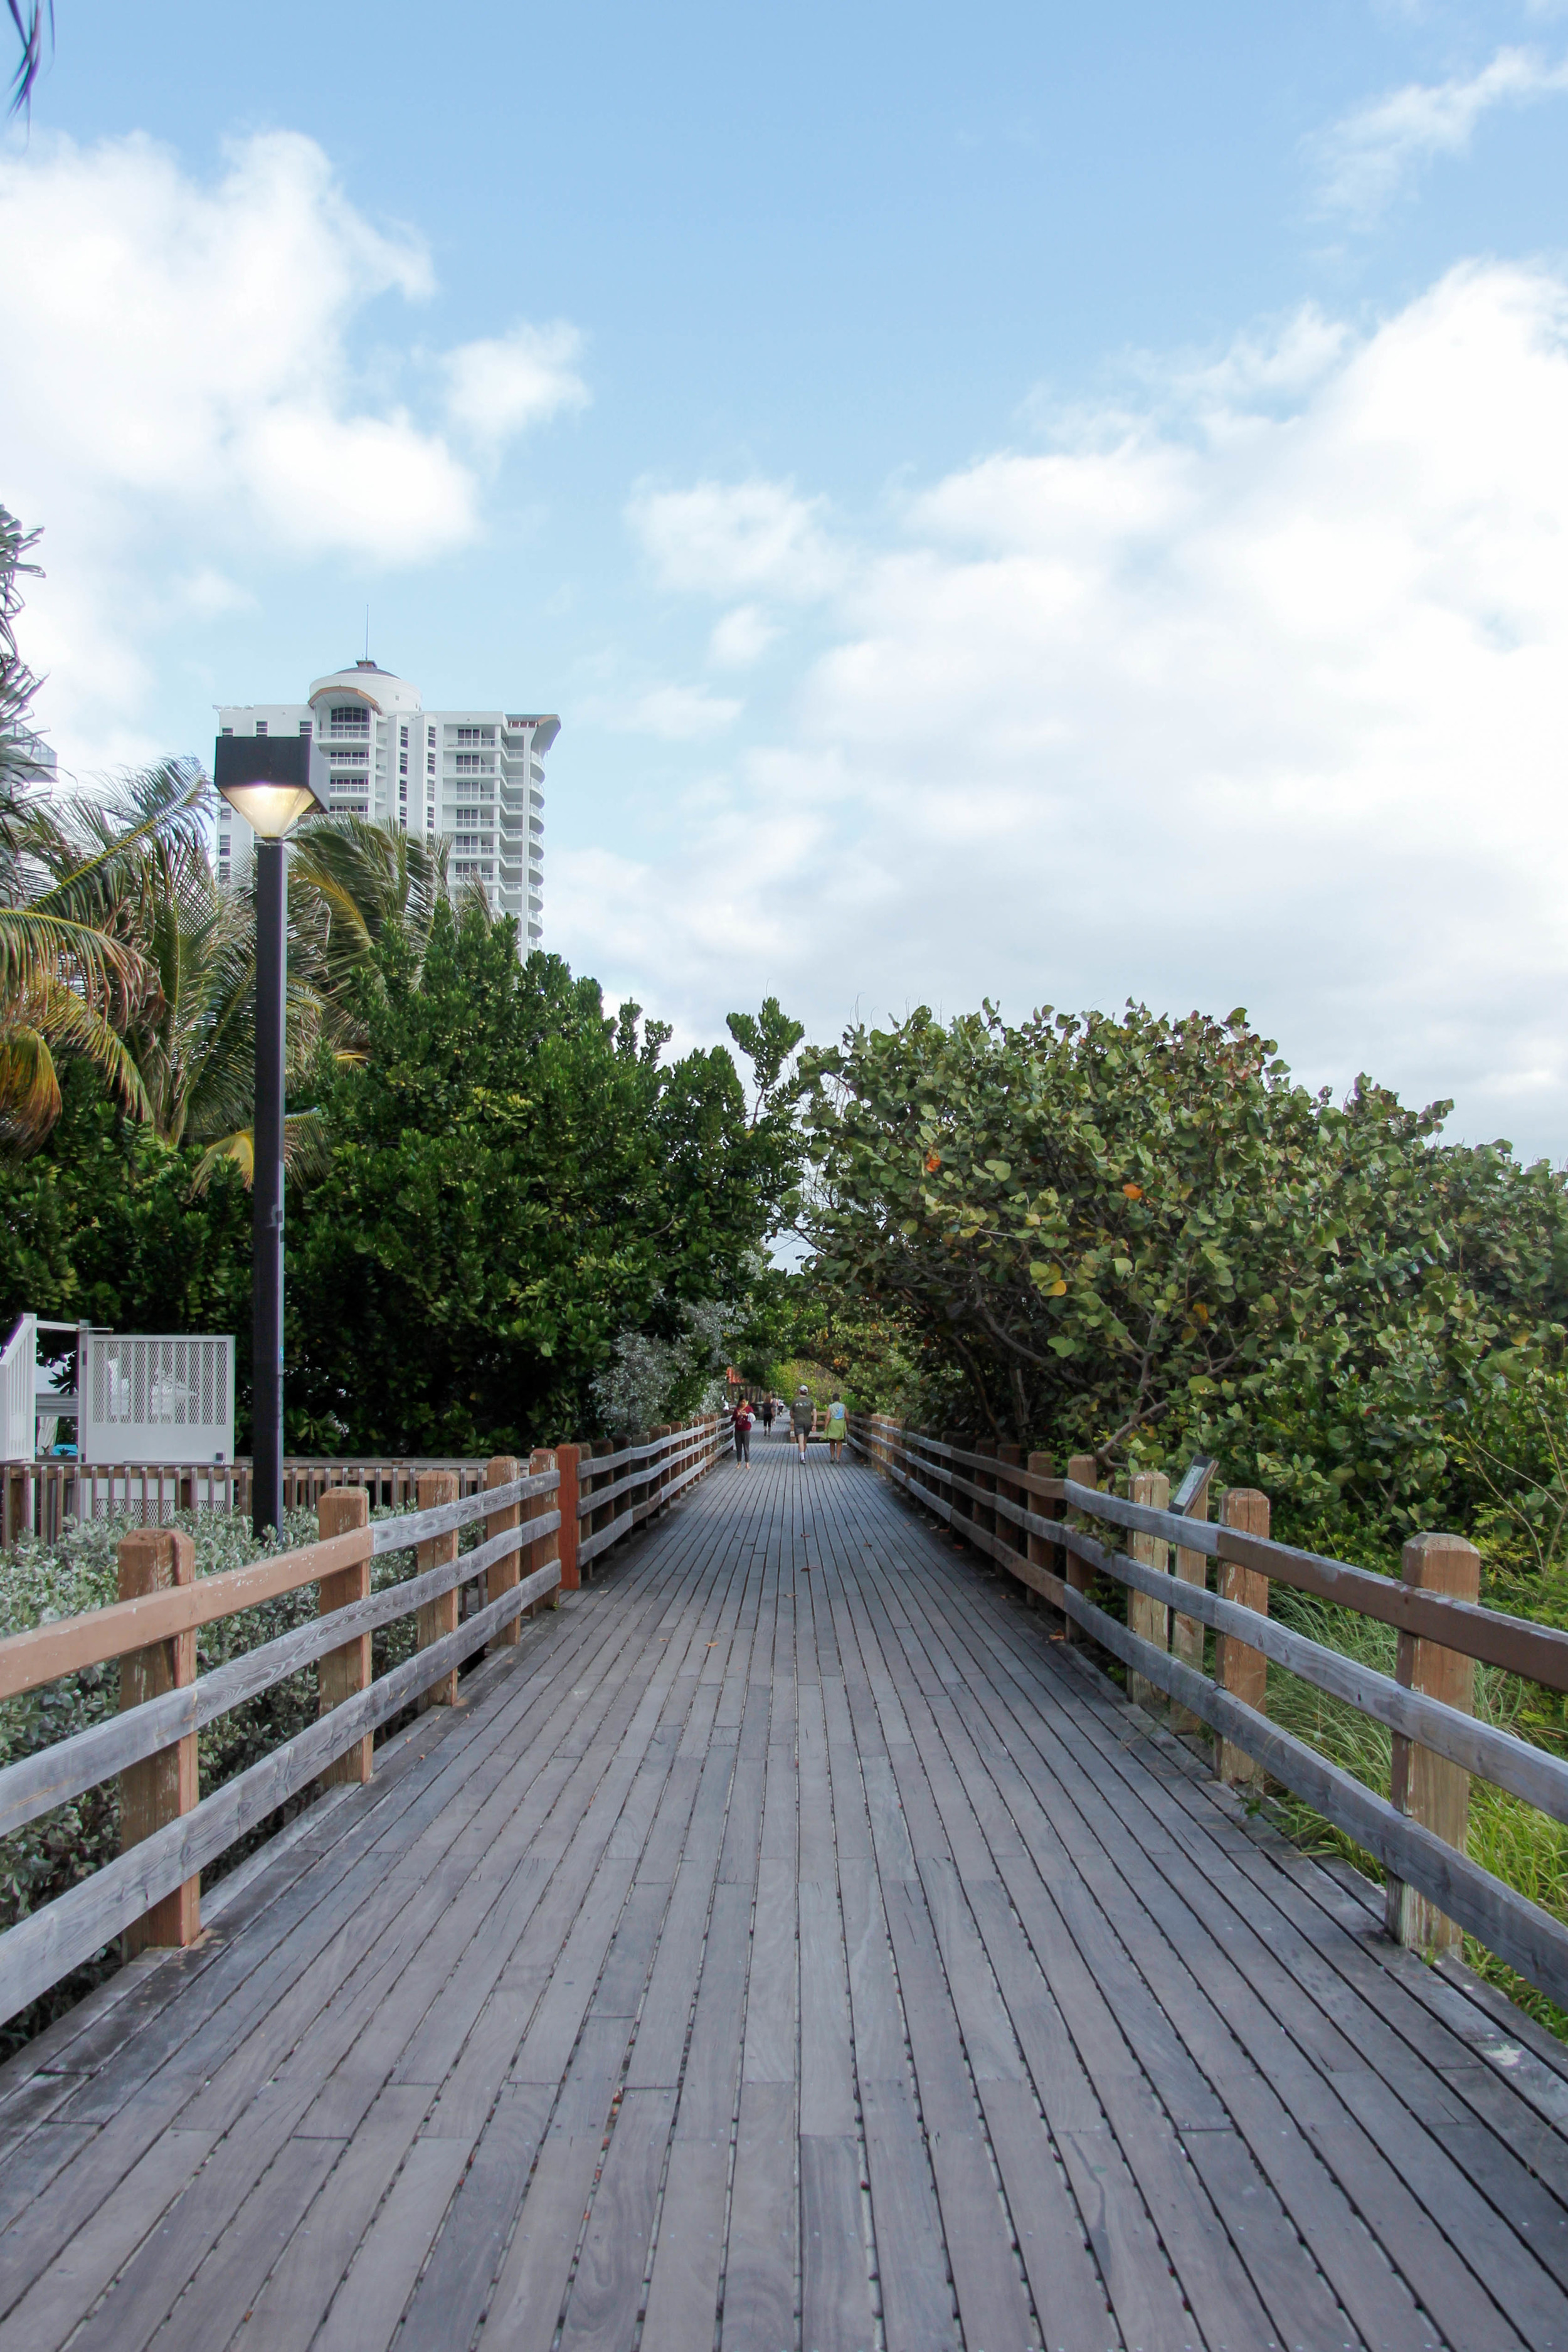 South Beach, Miami Boardwalk | 7 Ways to Stay Healthy While Traveling | Jennifer Diaz